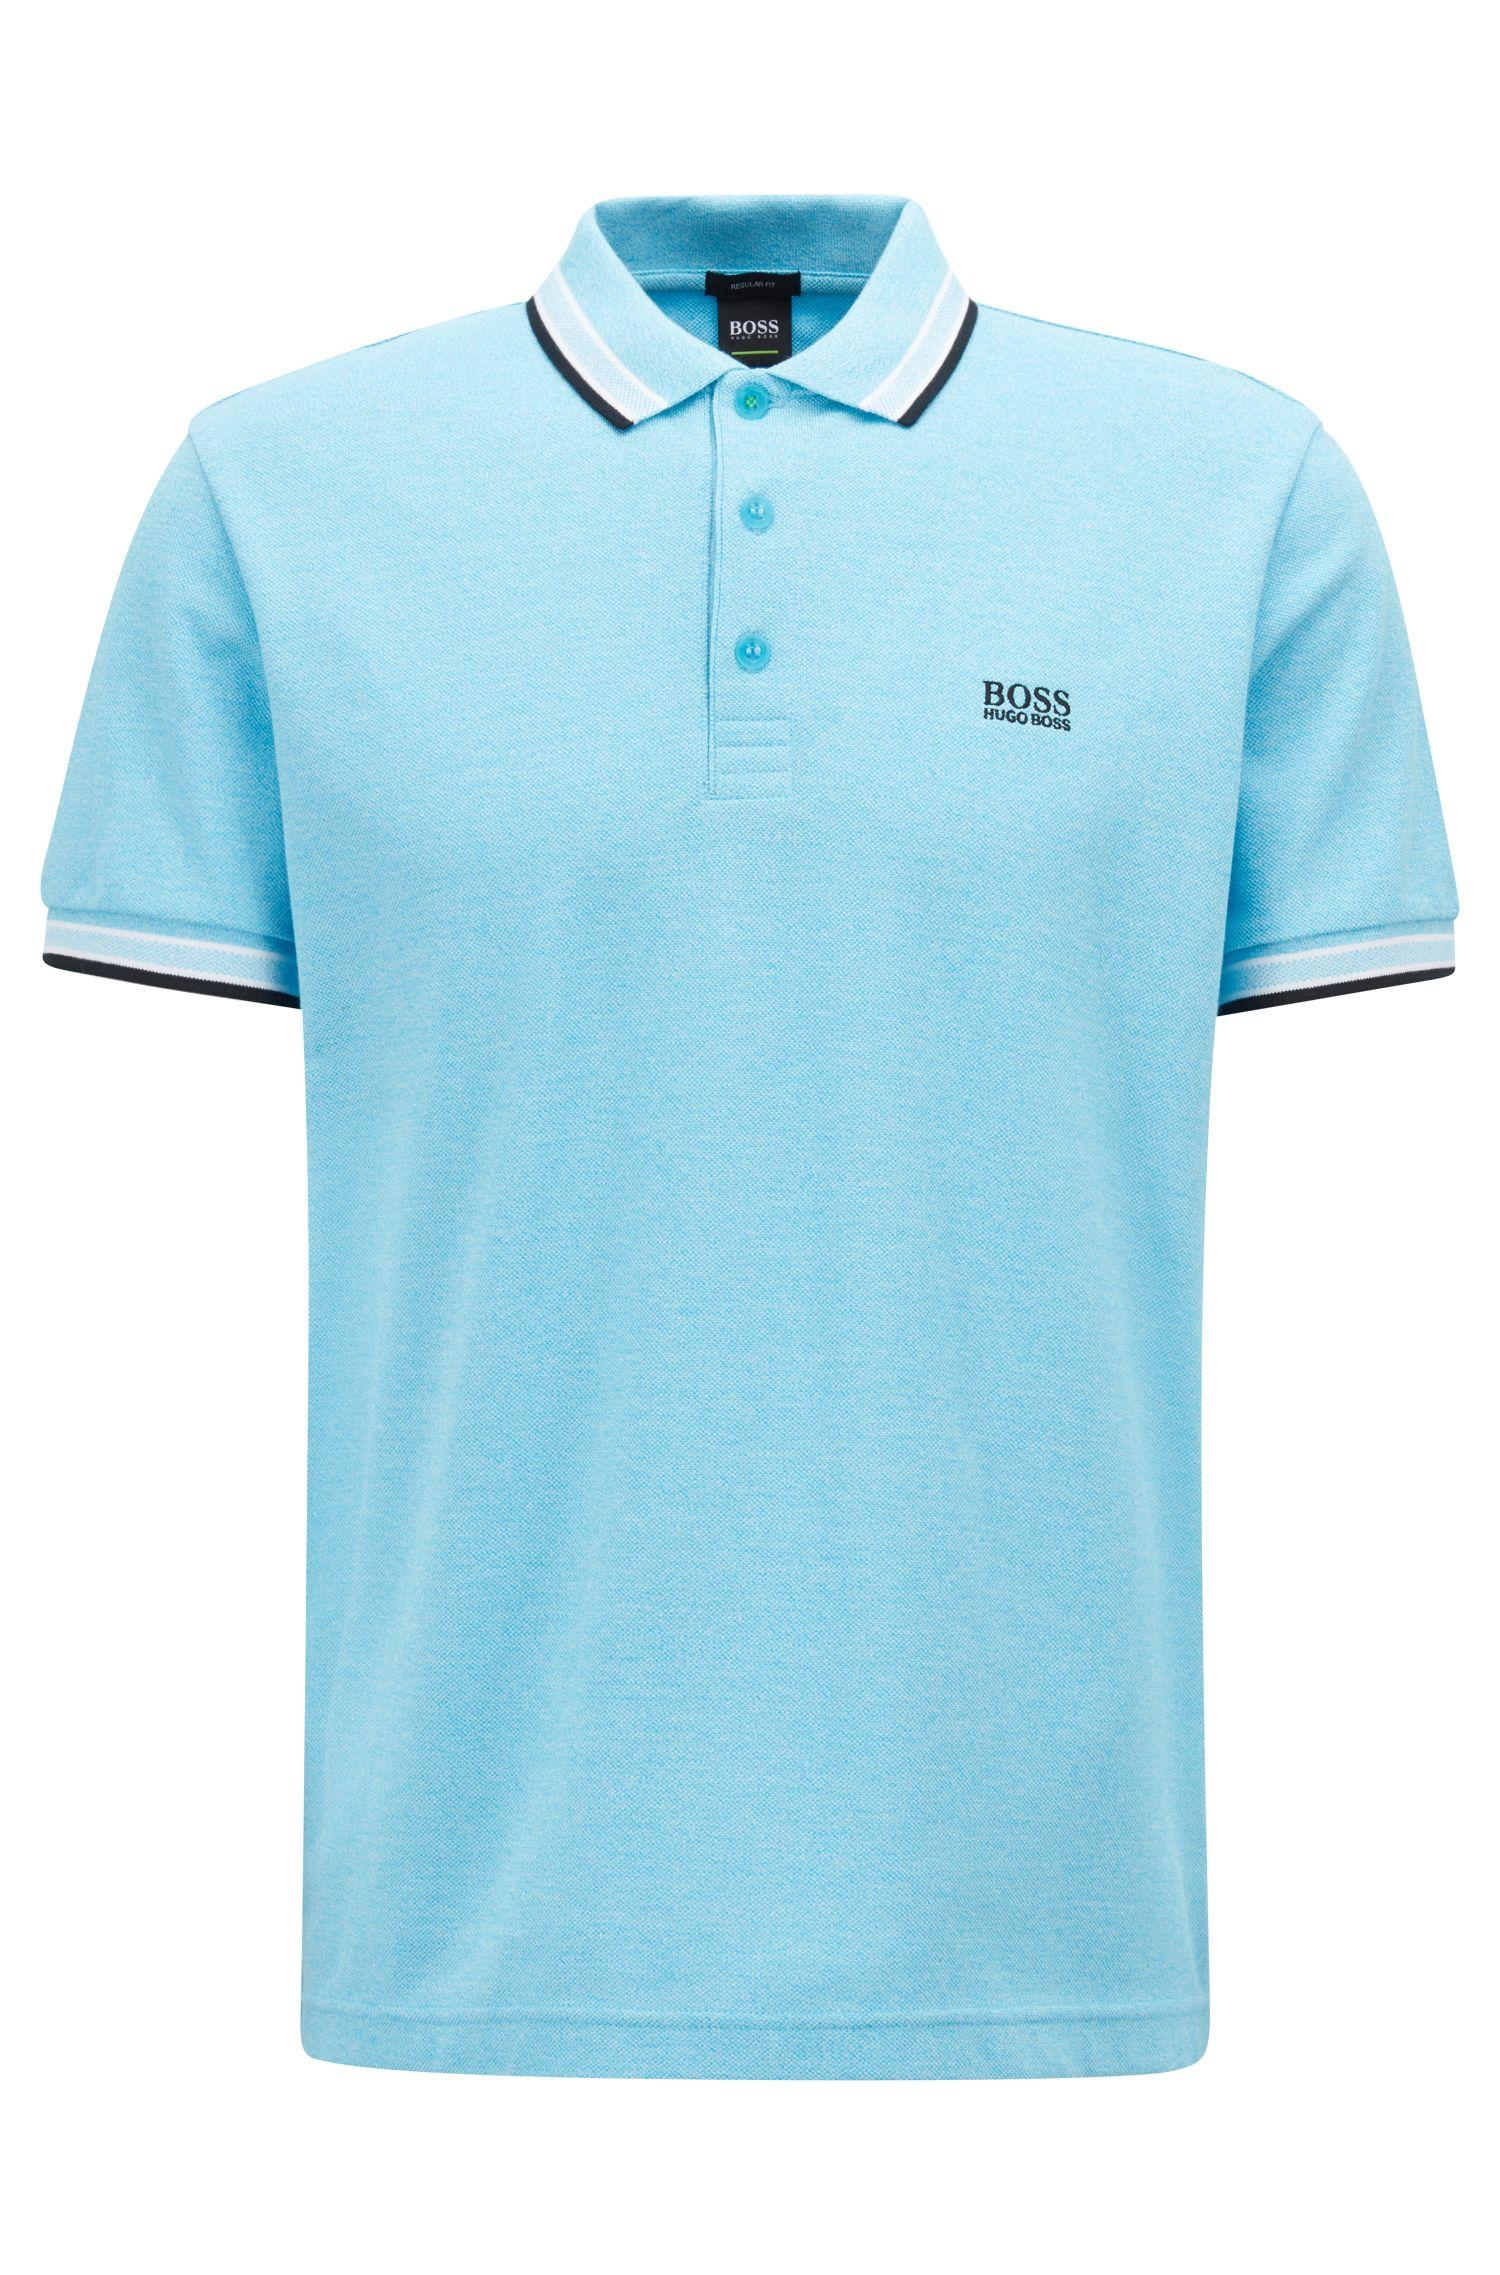 d7794e5e1 BOSS - Blue Cotton-piqué Polo Shirt With Logo Undercollar for Men - Lyst.  View fullscreen